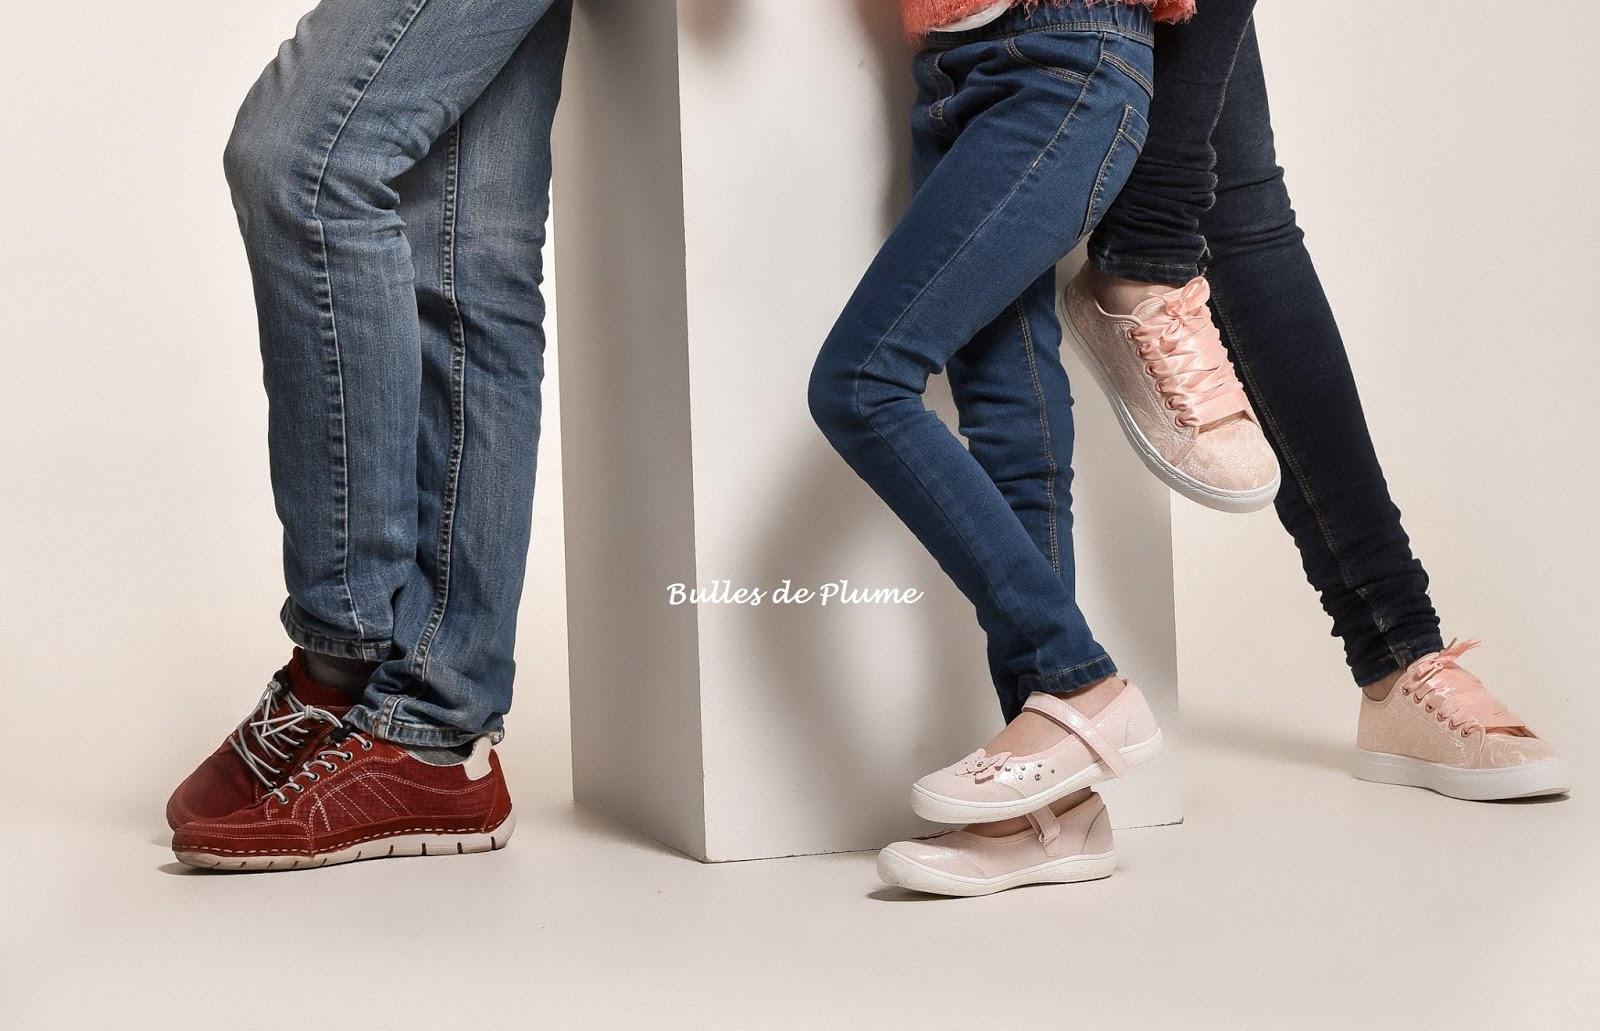 1b7a8327677 BullesdePlume-Gemo-chaussures-homme-femme-enfant